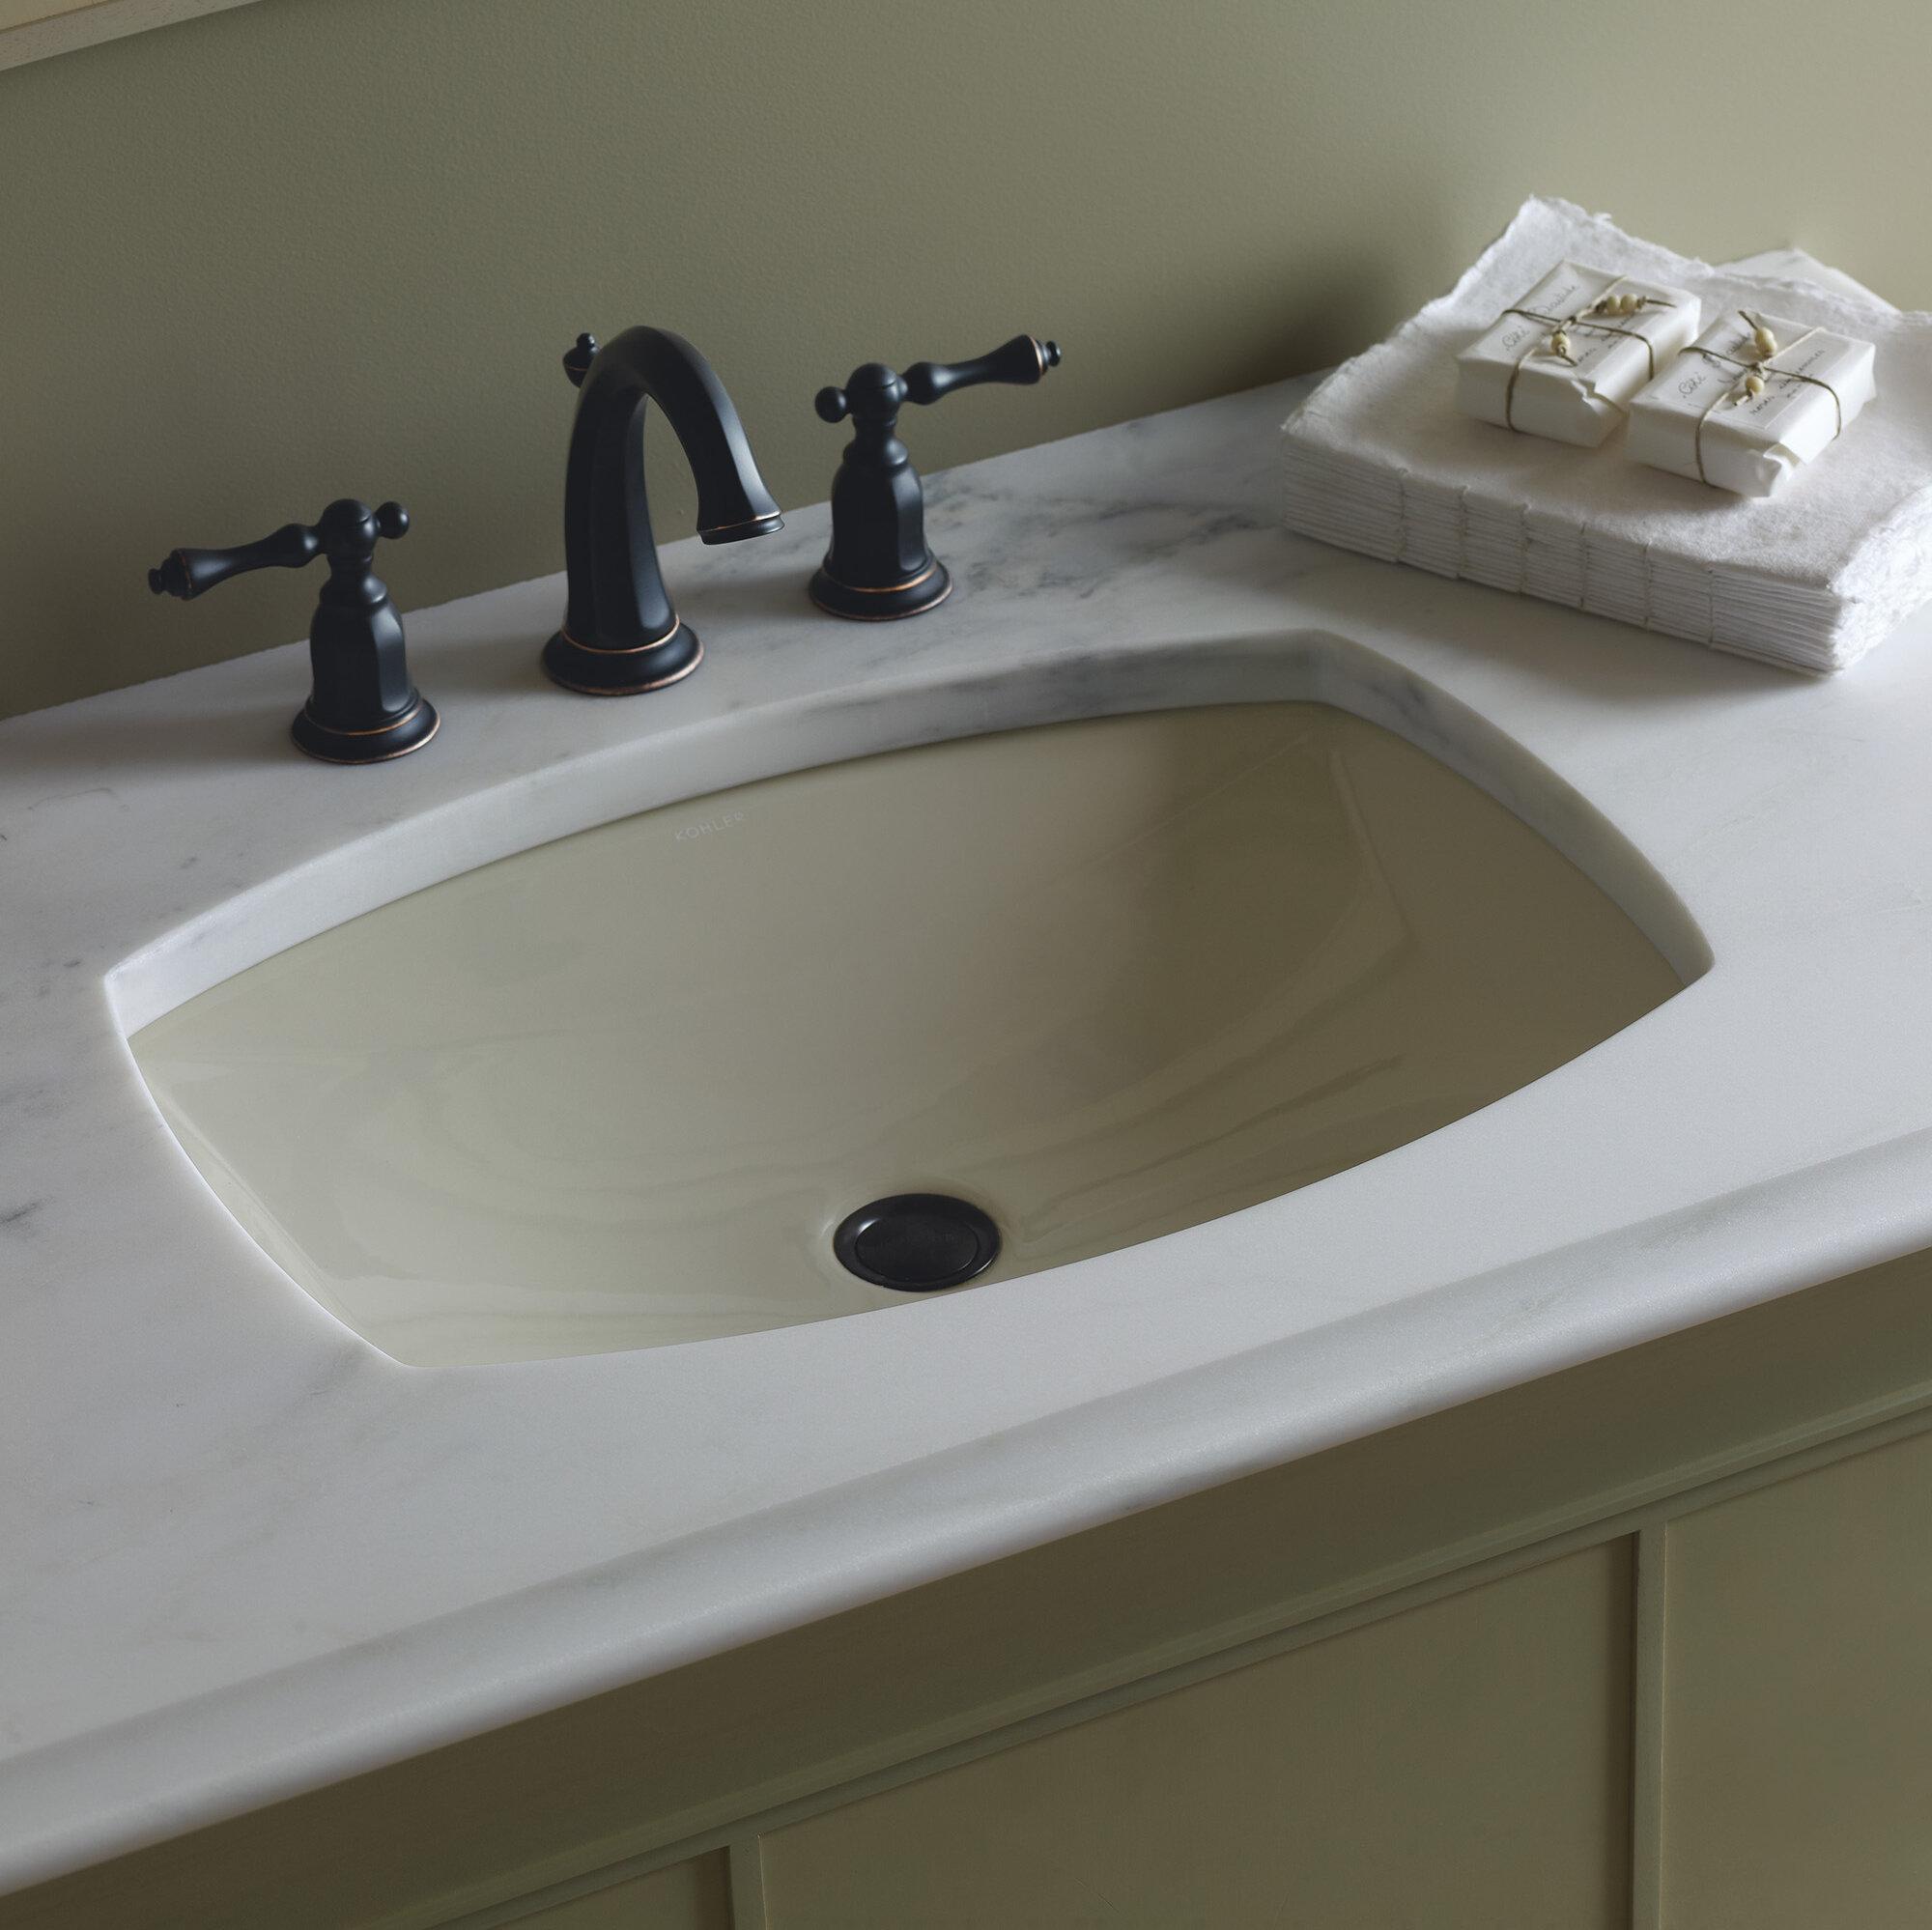 K 2382 09596 kohler kelston ceramic rectangular undermount bathroom sink with overflow reviews wayfair